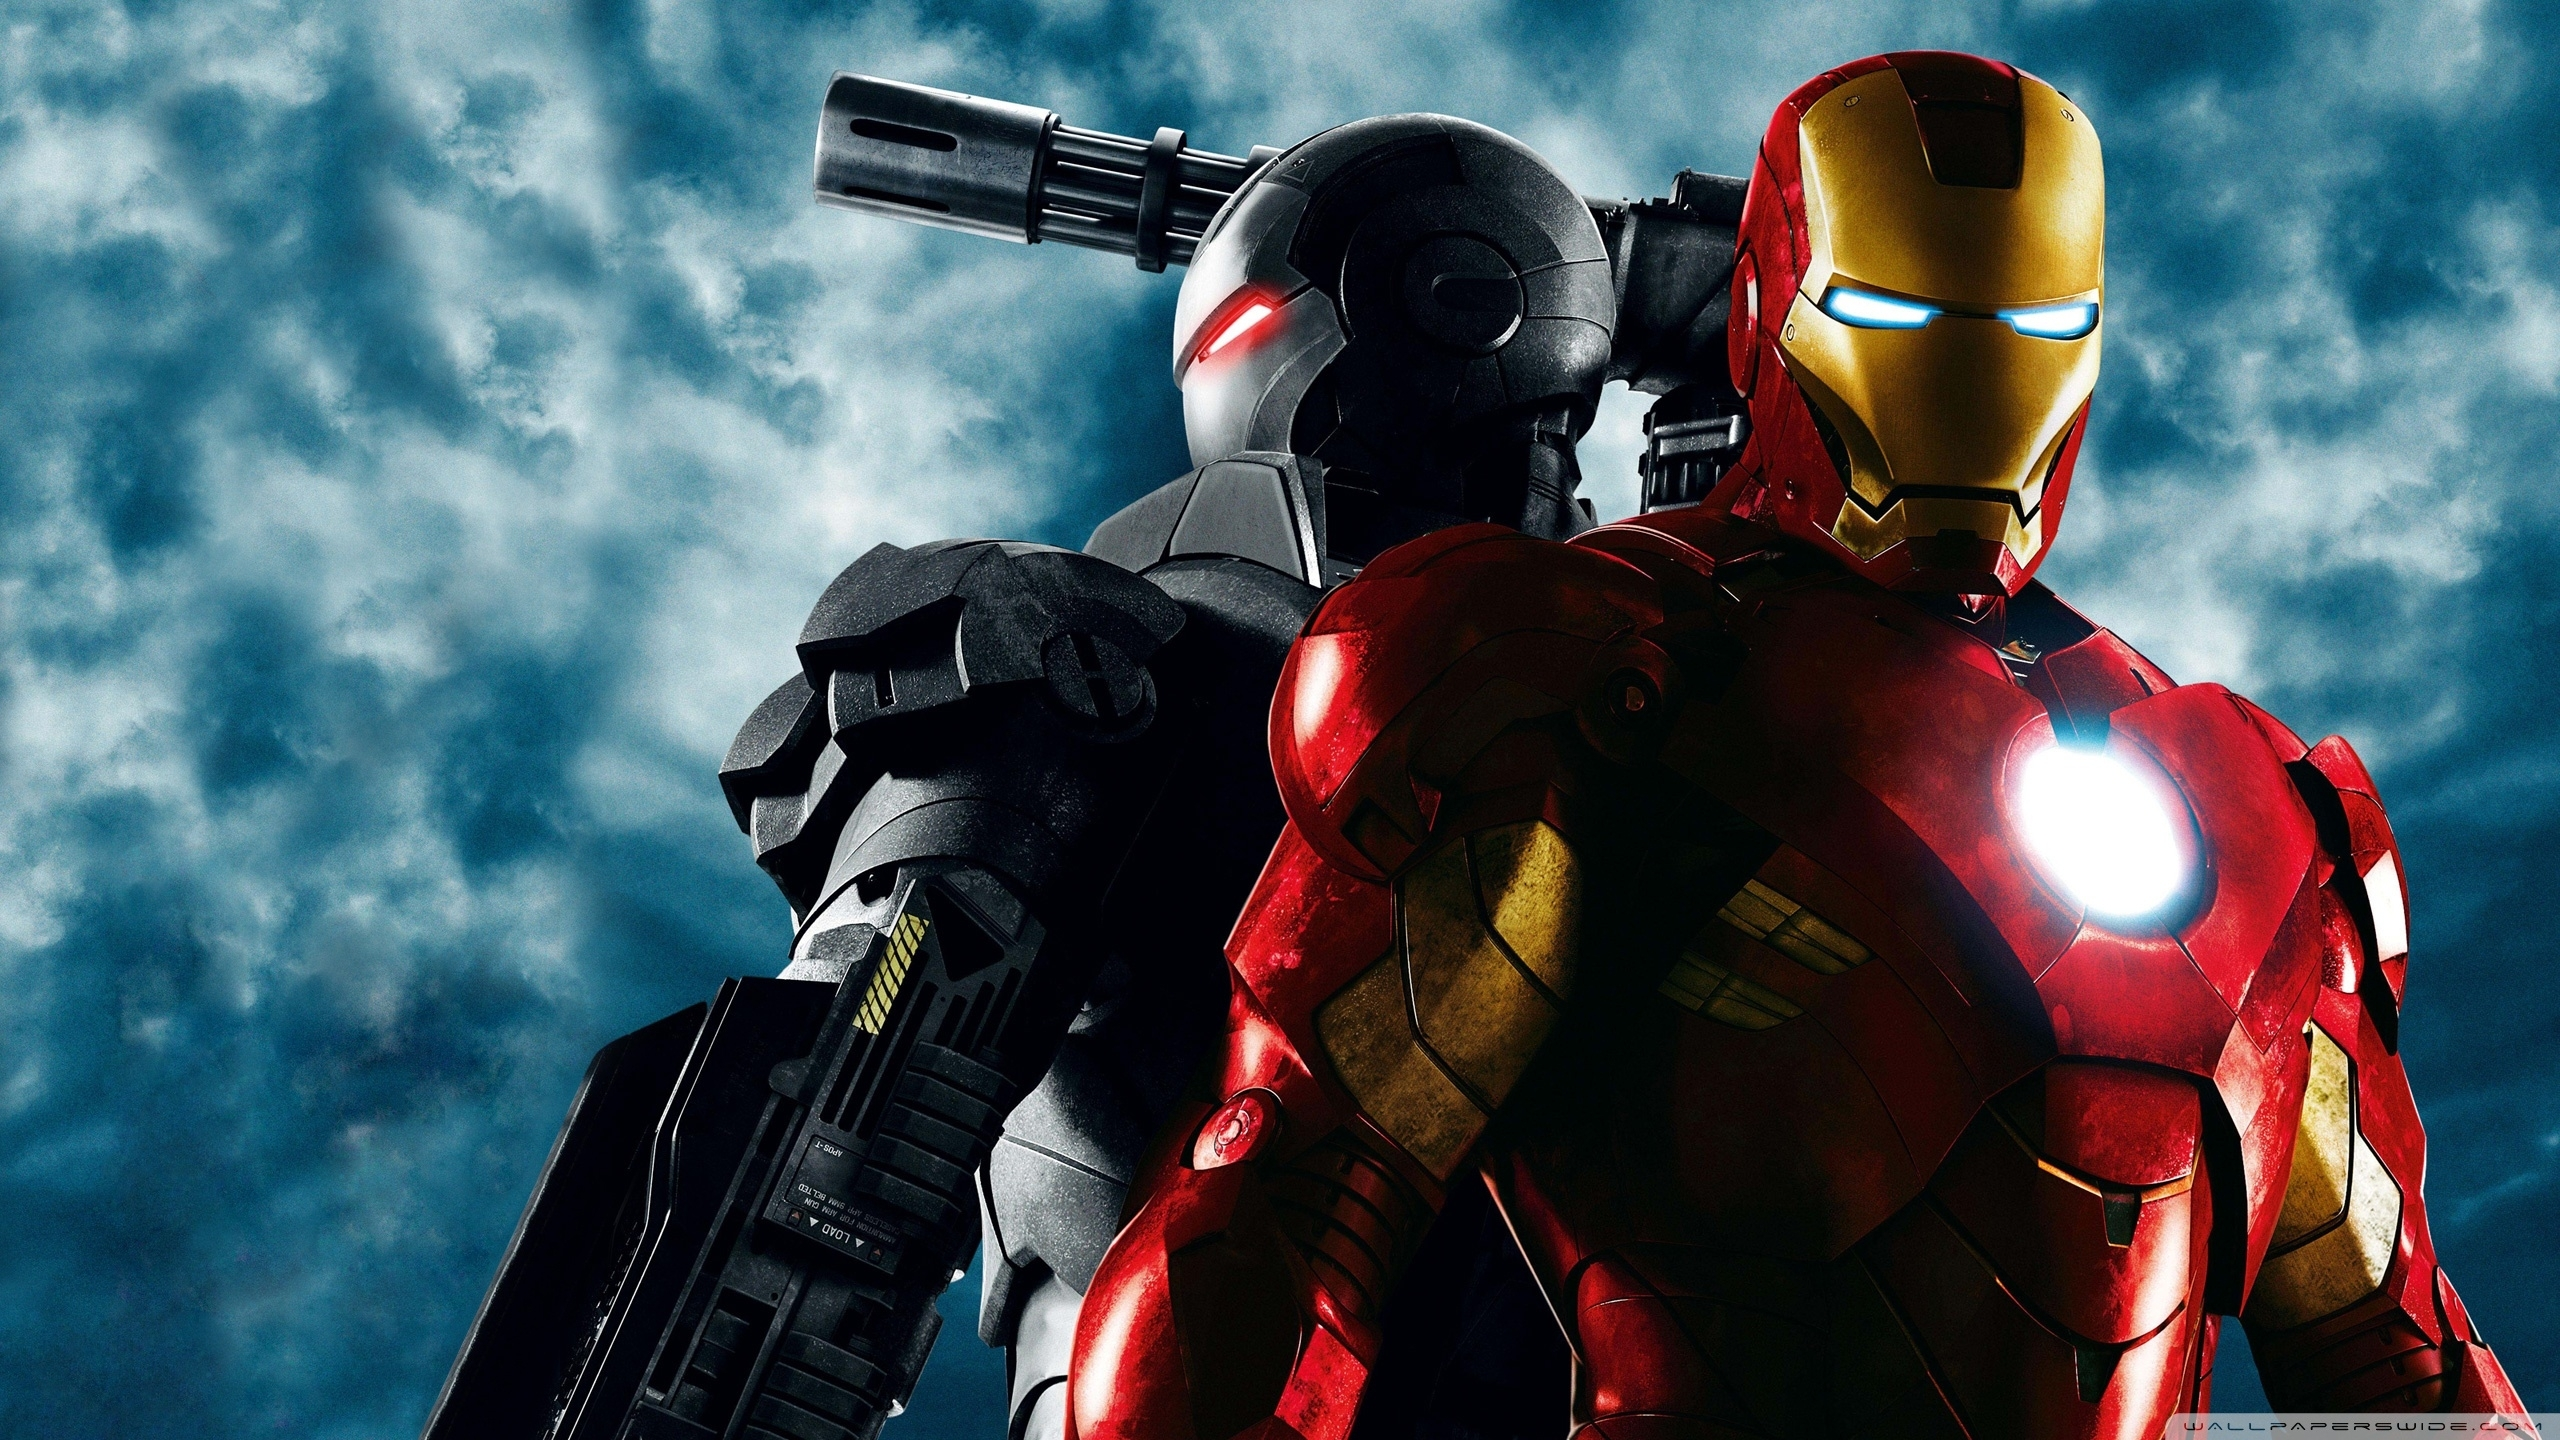 war machine and iron man, iron man 2 ❤ 4k hd desktop wallpaper for